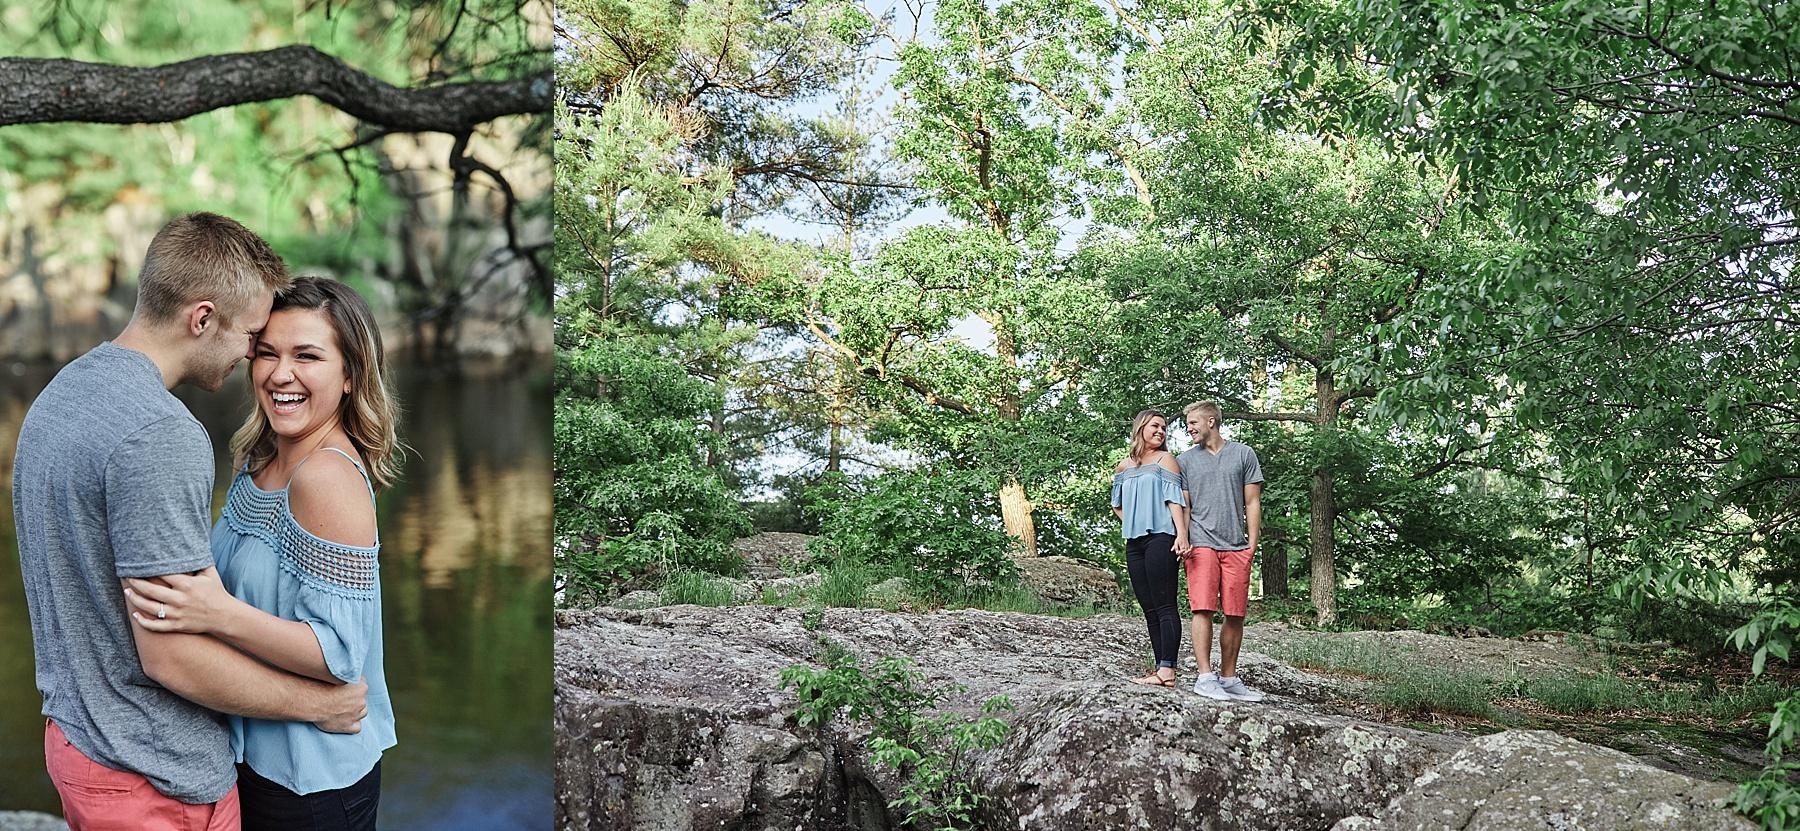 Destination-Engagement-Taylors-Falls-Minnesota-Minneapolis-Mayowood-Stone-Barn_0060.jpg